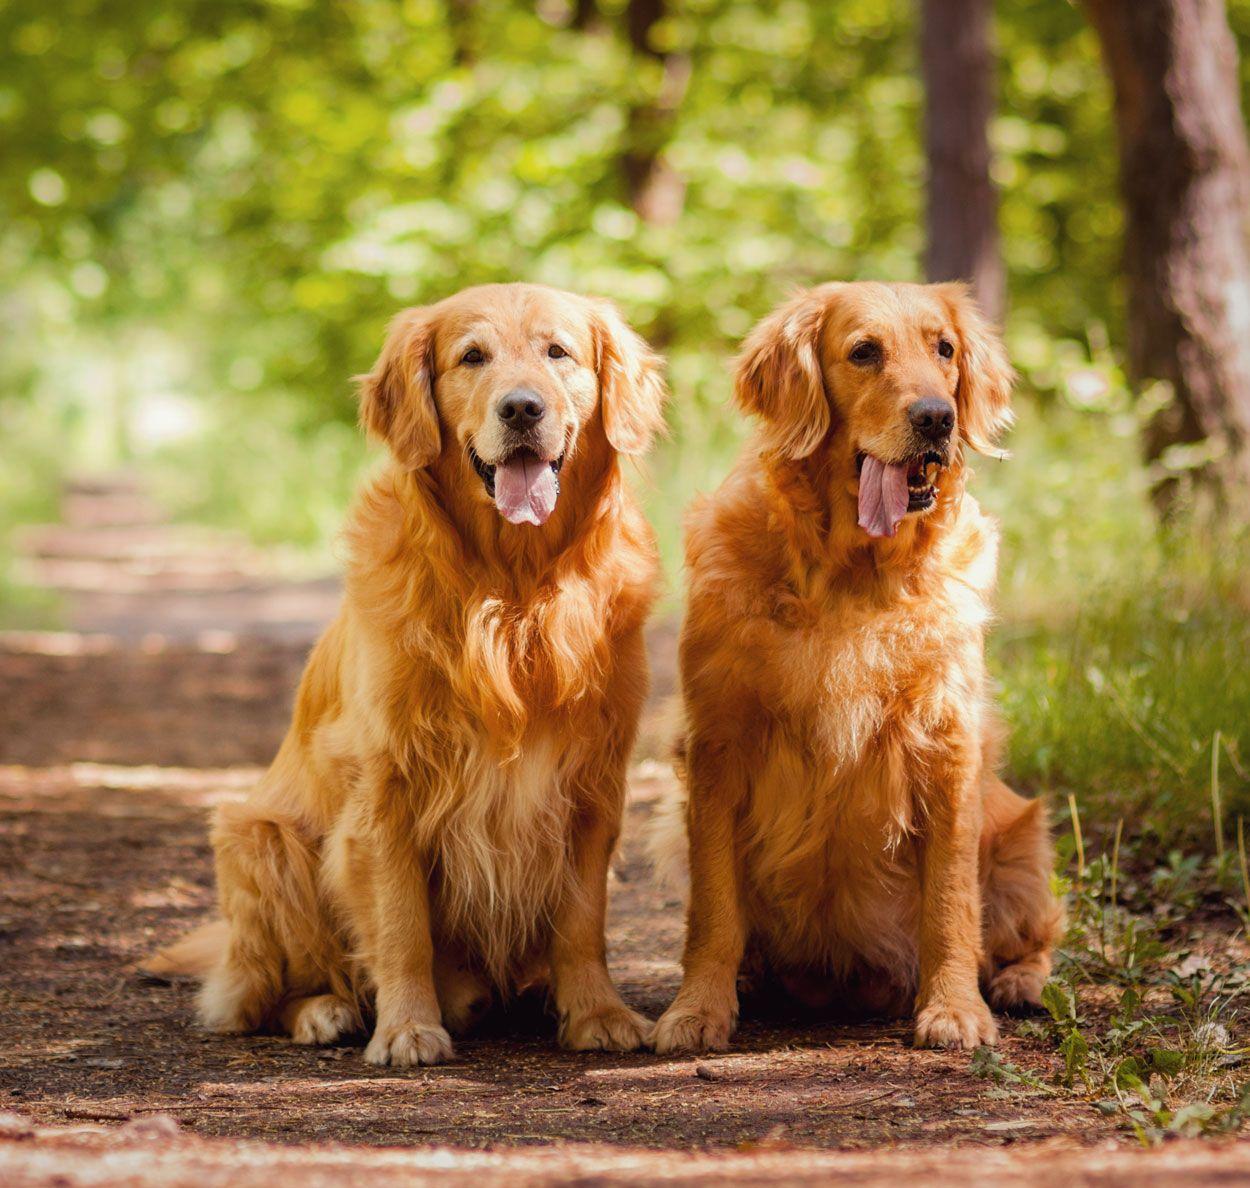 Pin By Big Barker Dog Beds On Gorgeous Golden Retrievers Golden